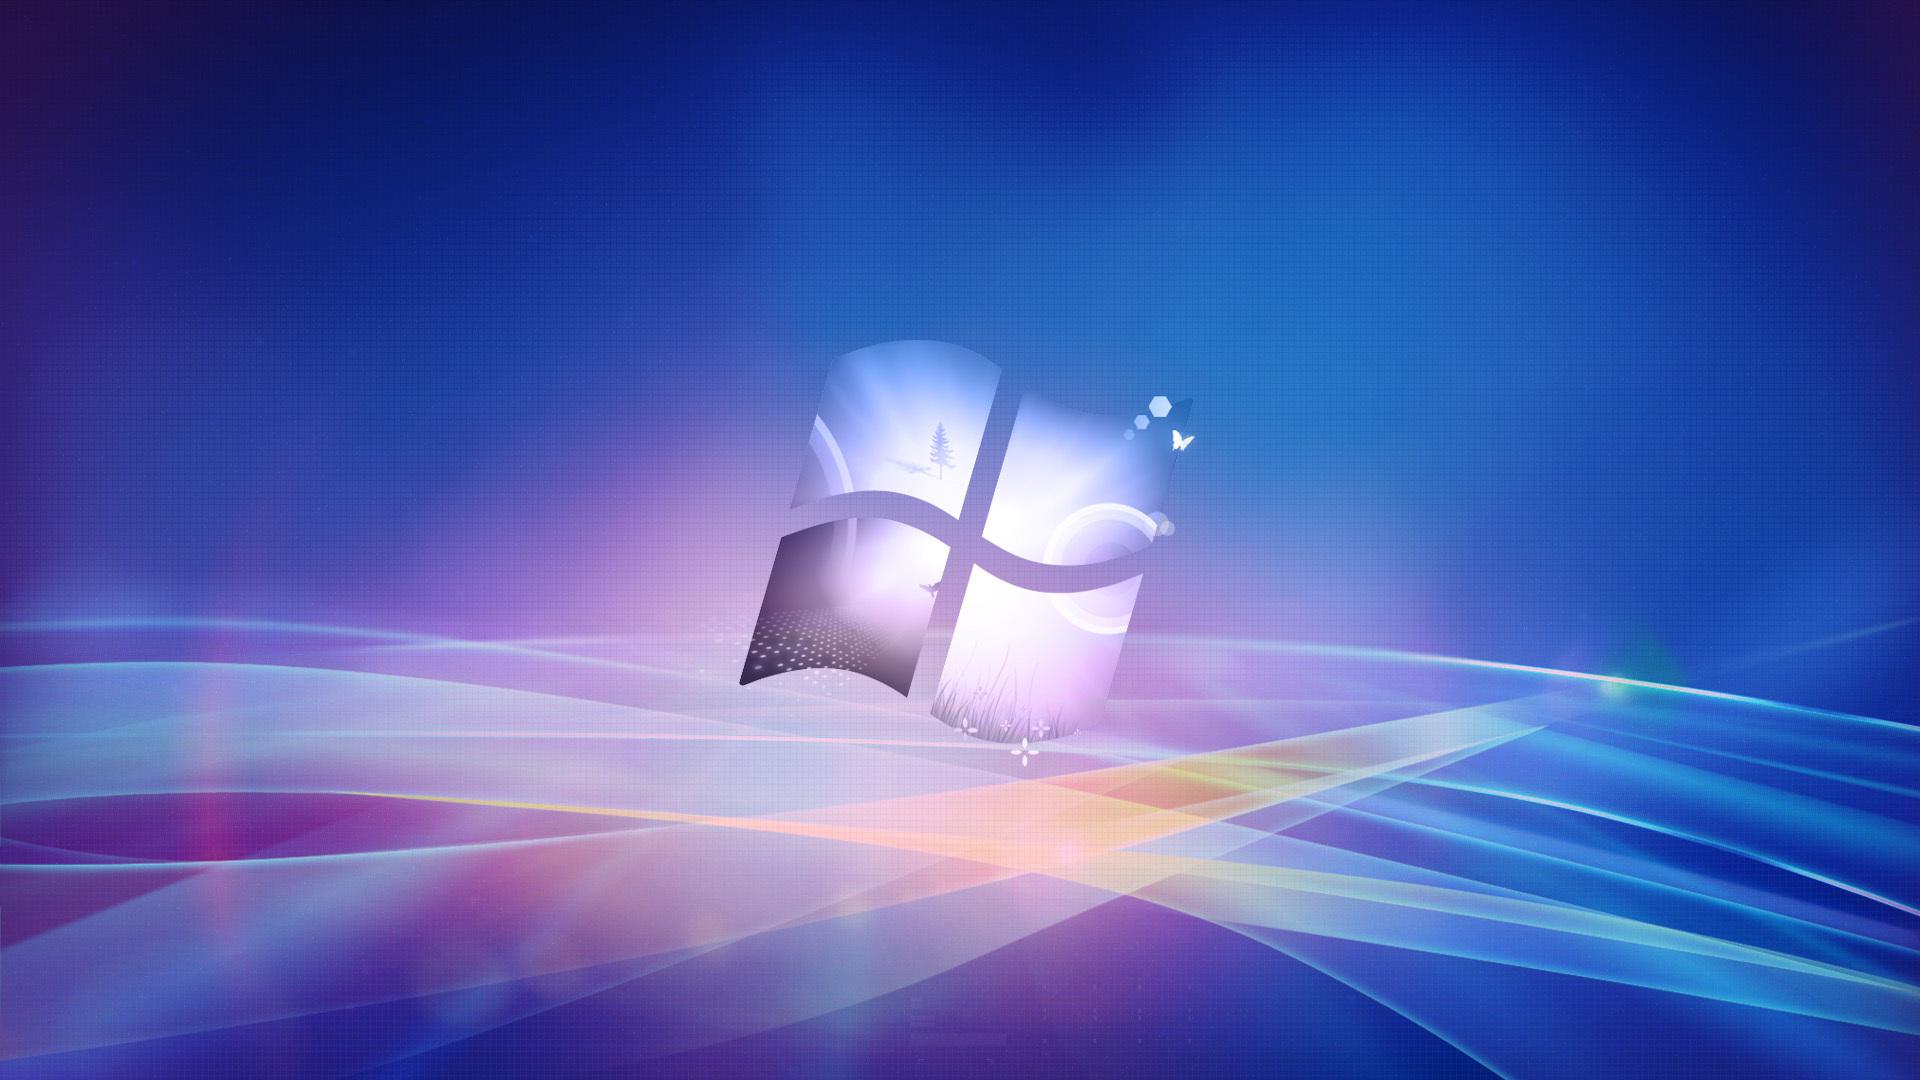 Windows Fond D Ecran Hd Arriere Plan 1920x1080 Id 230796 Wallpaper Abyss